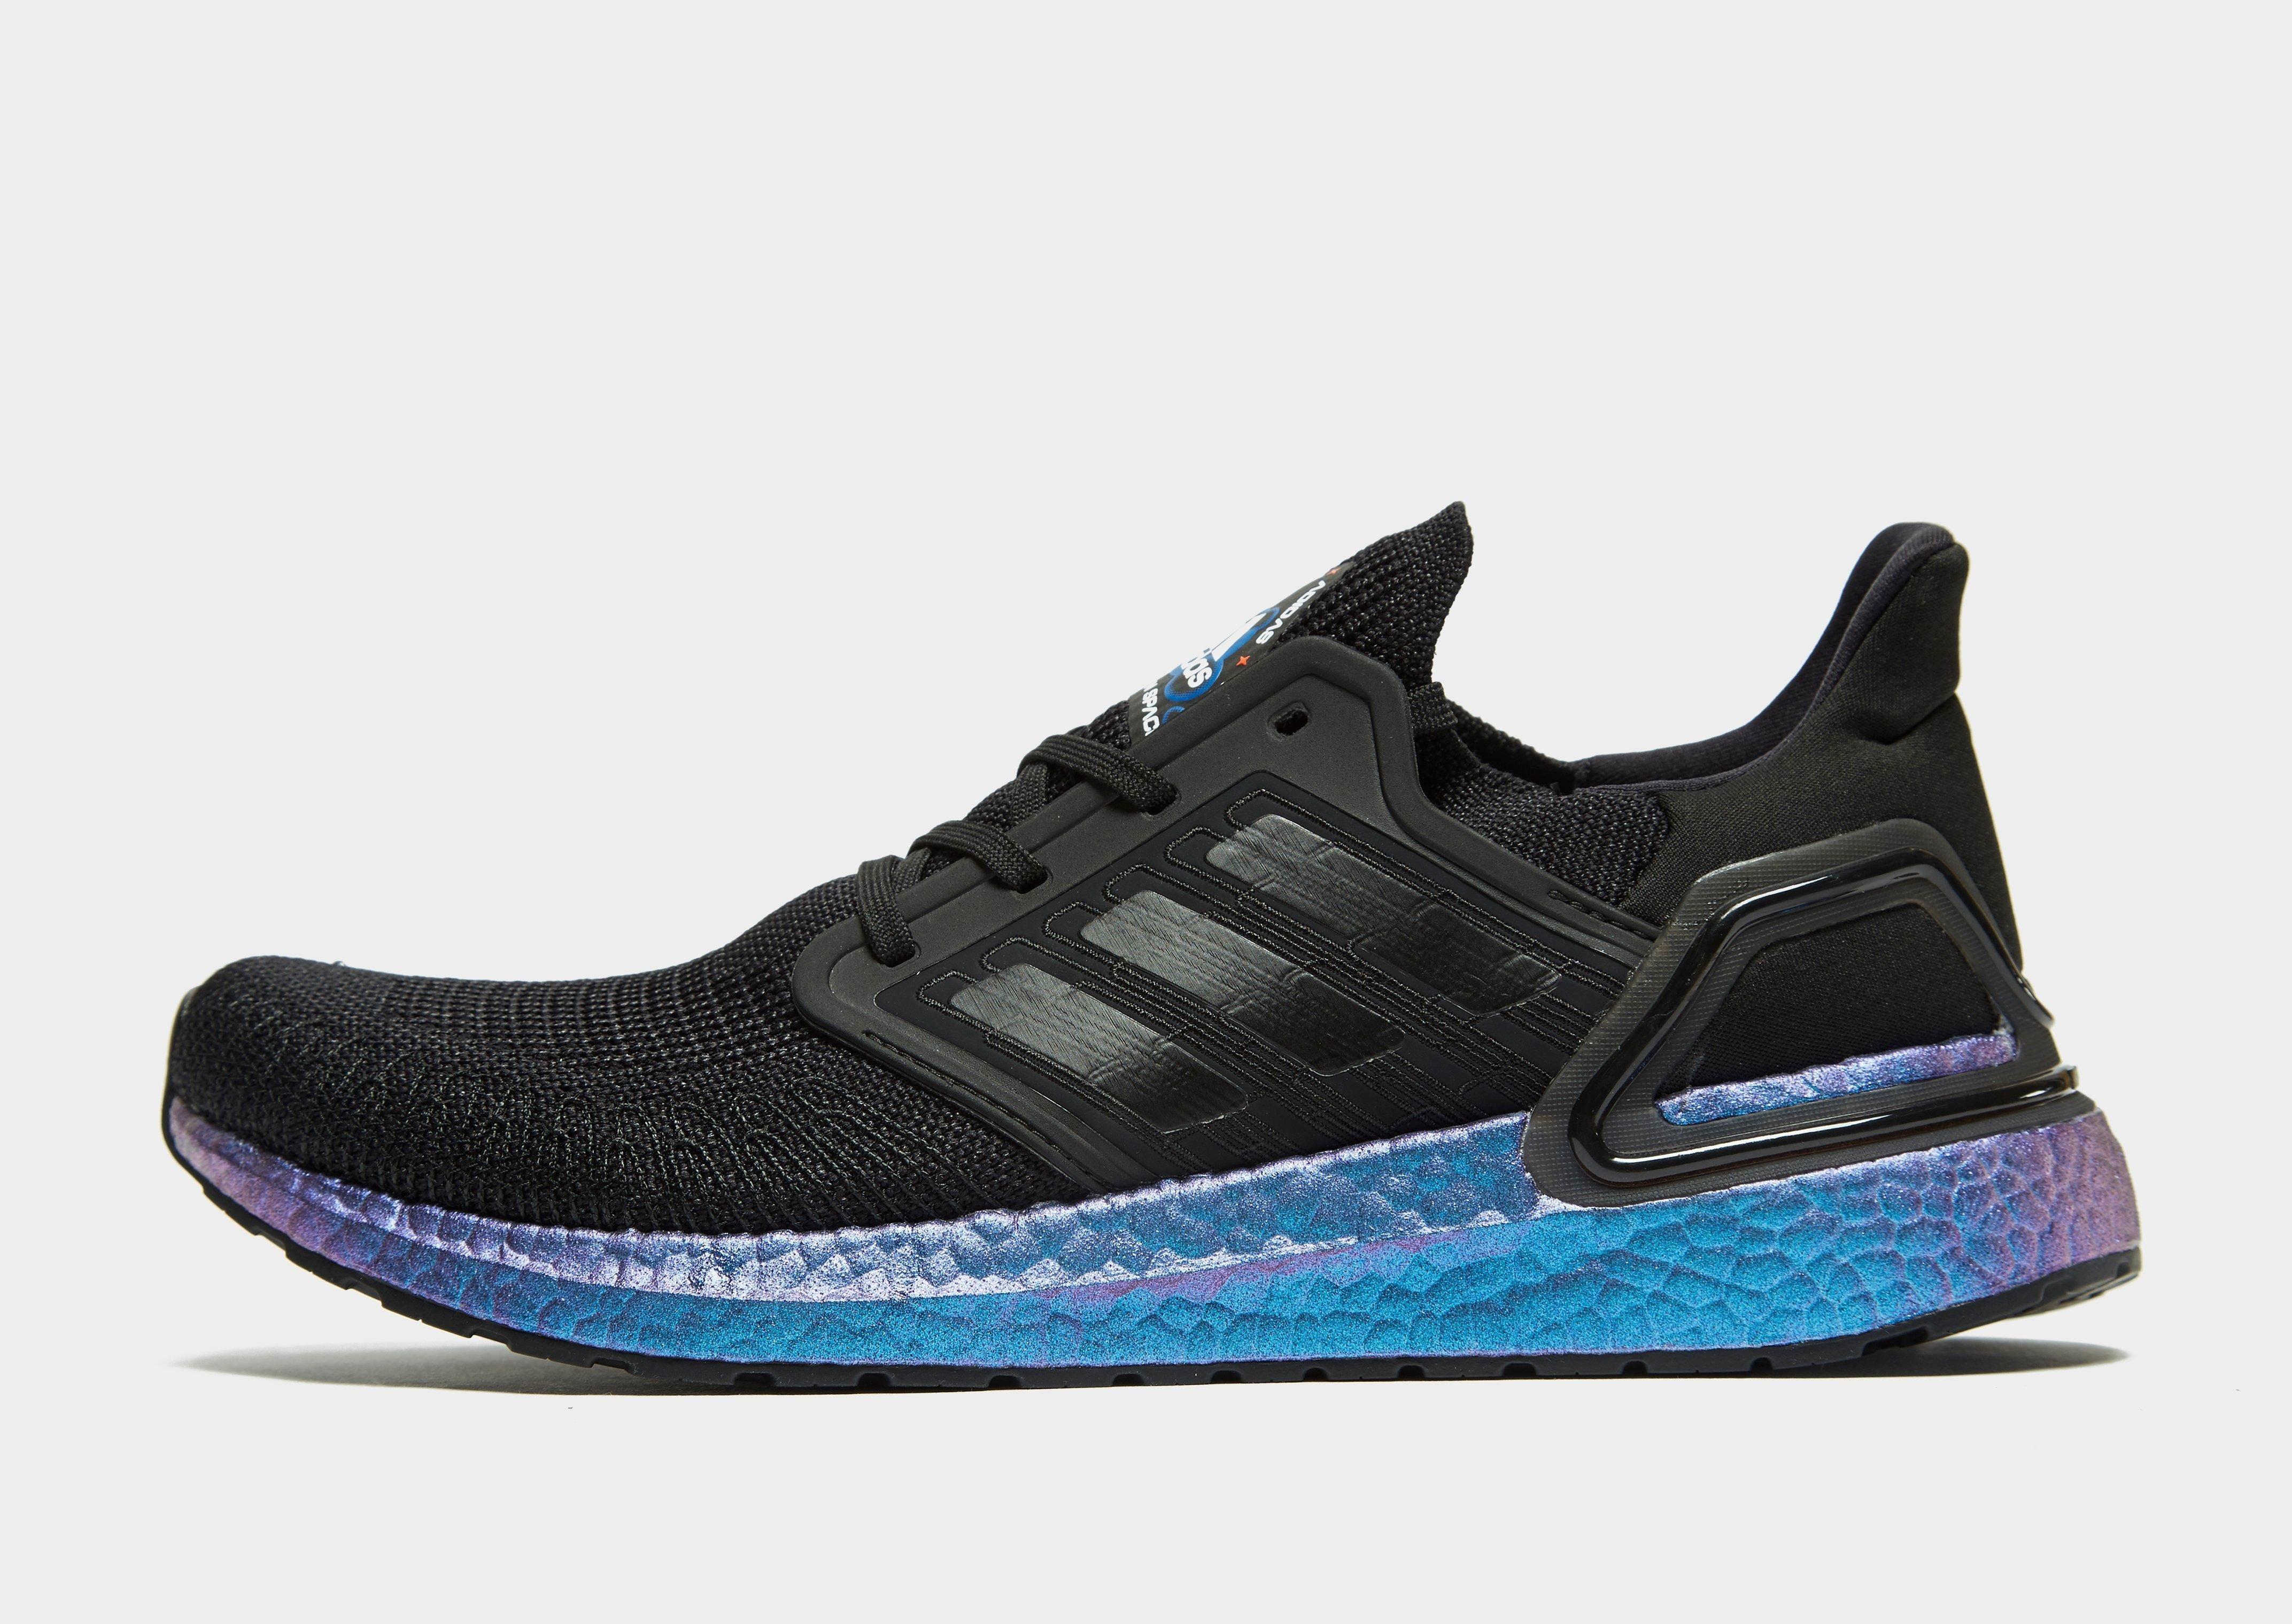 Adidas Ultra Boost 20 by Jd Sports